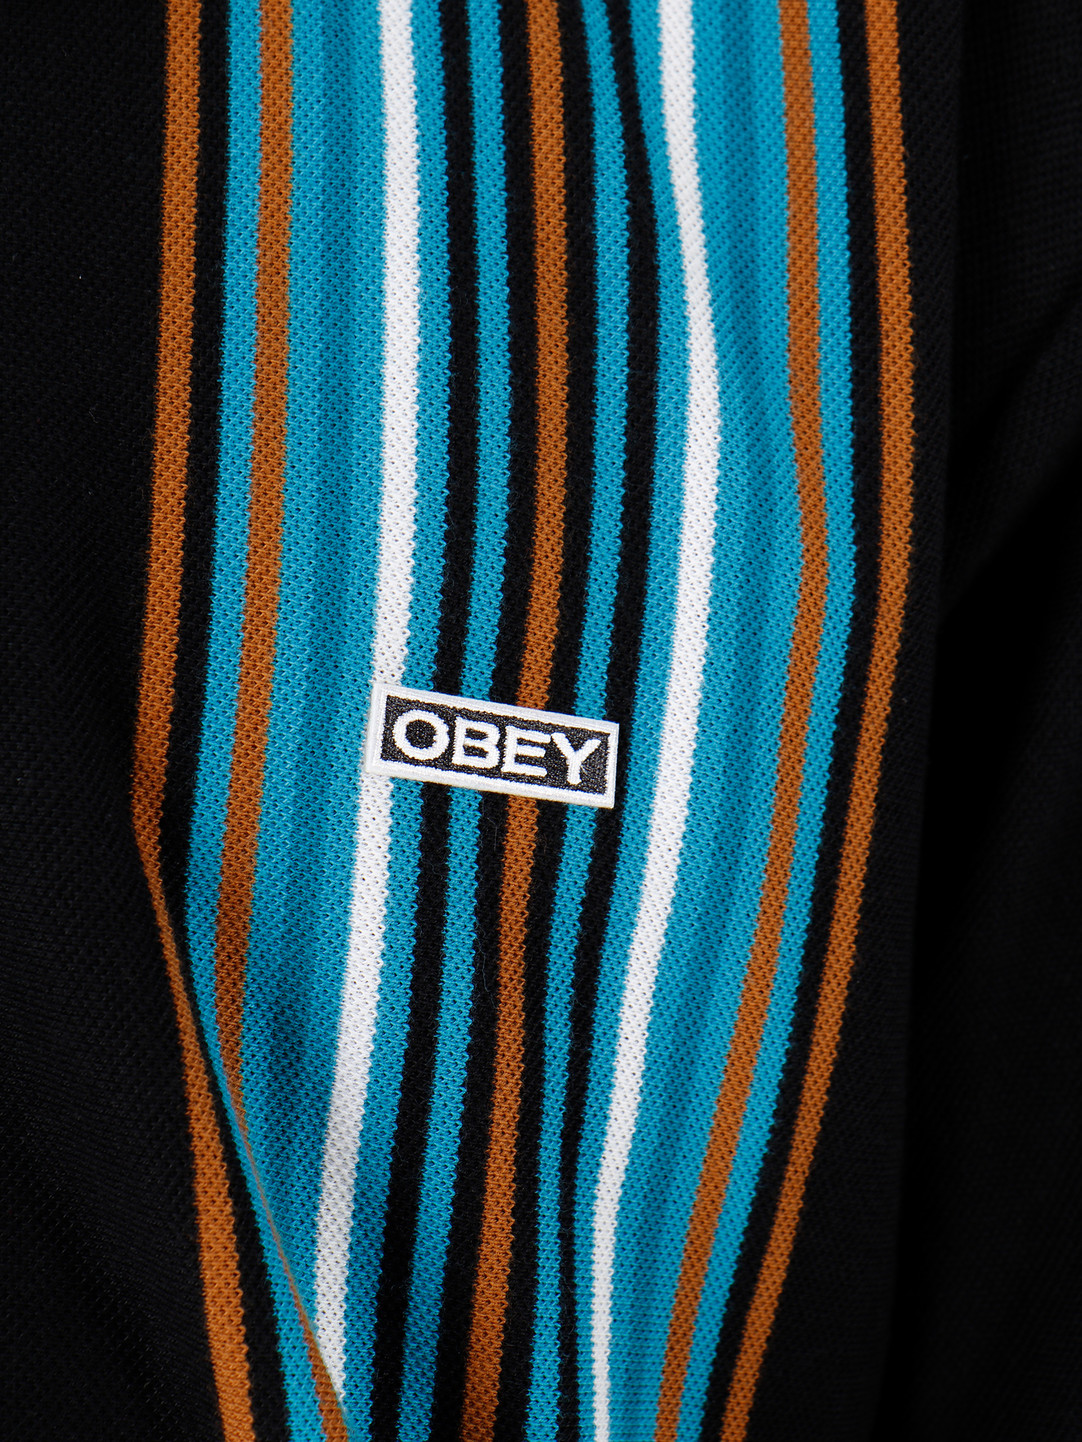 Obey Obey Shortsleeve Polo Black Multi 131090048-BKM